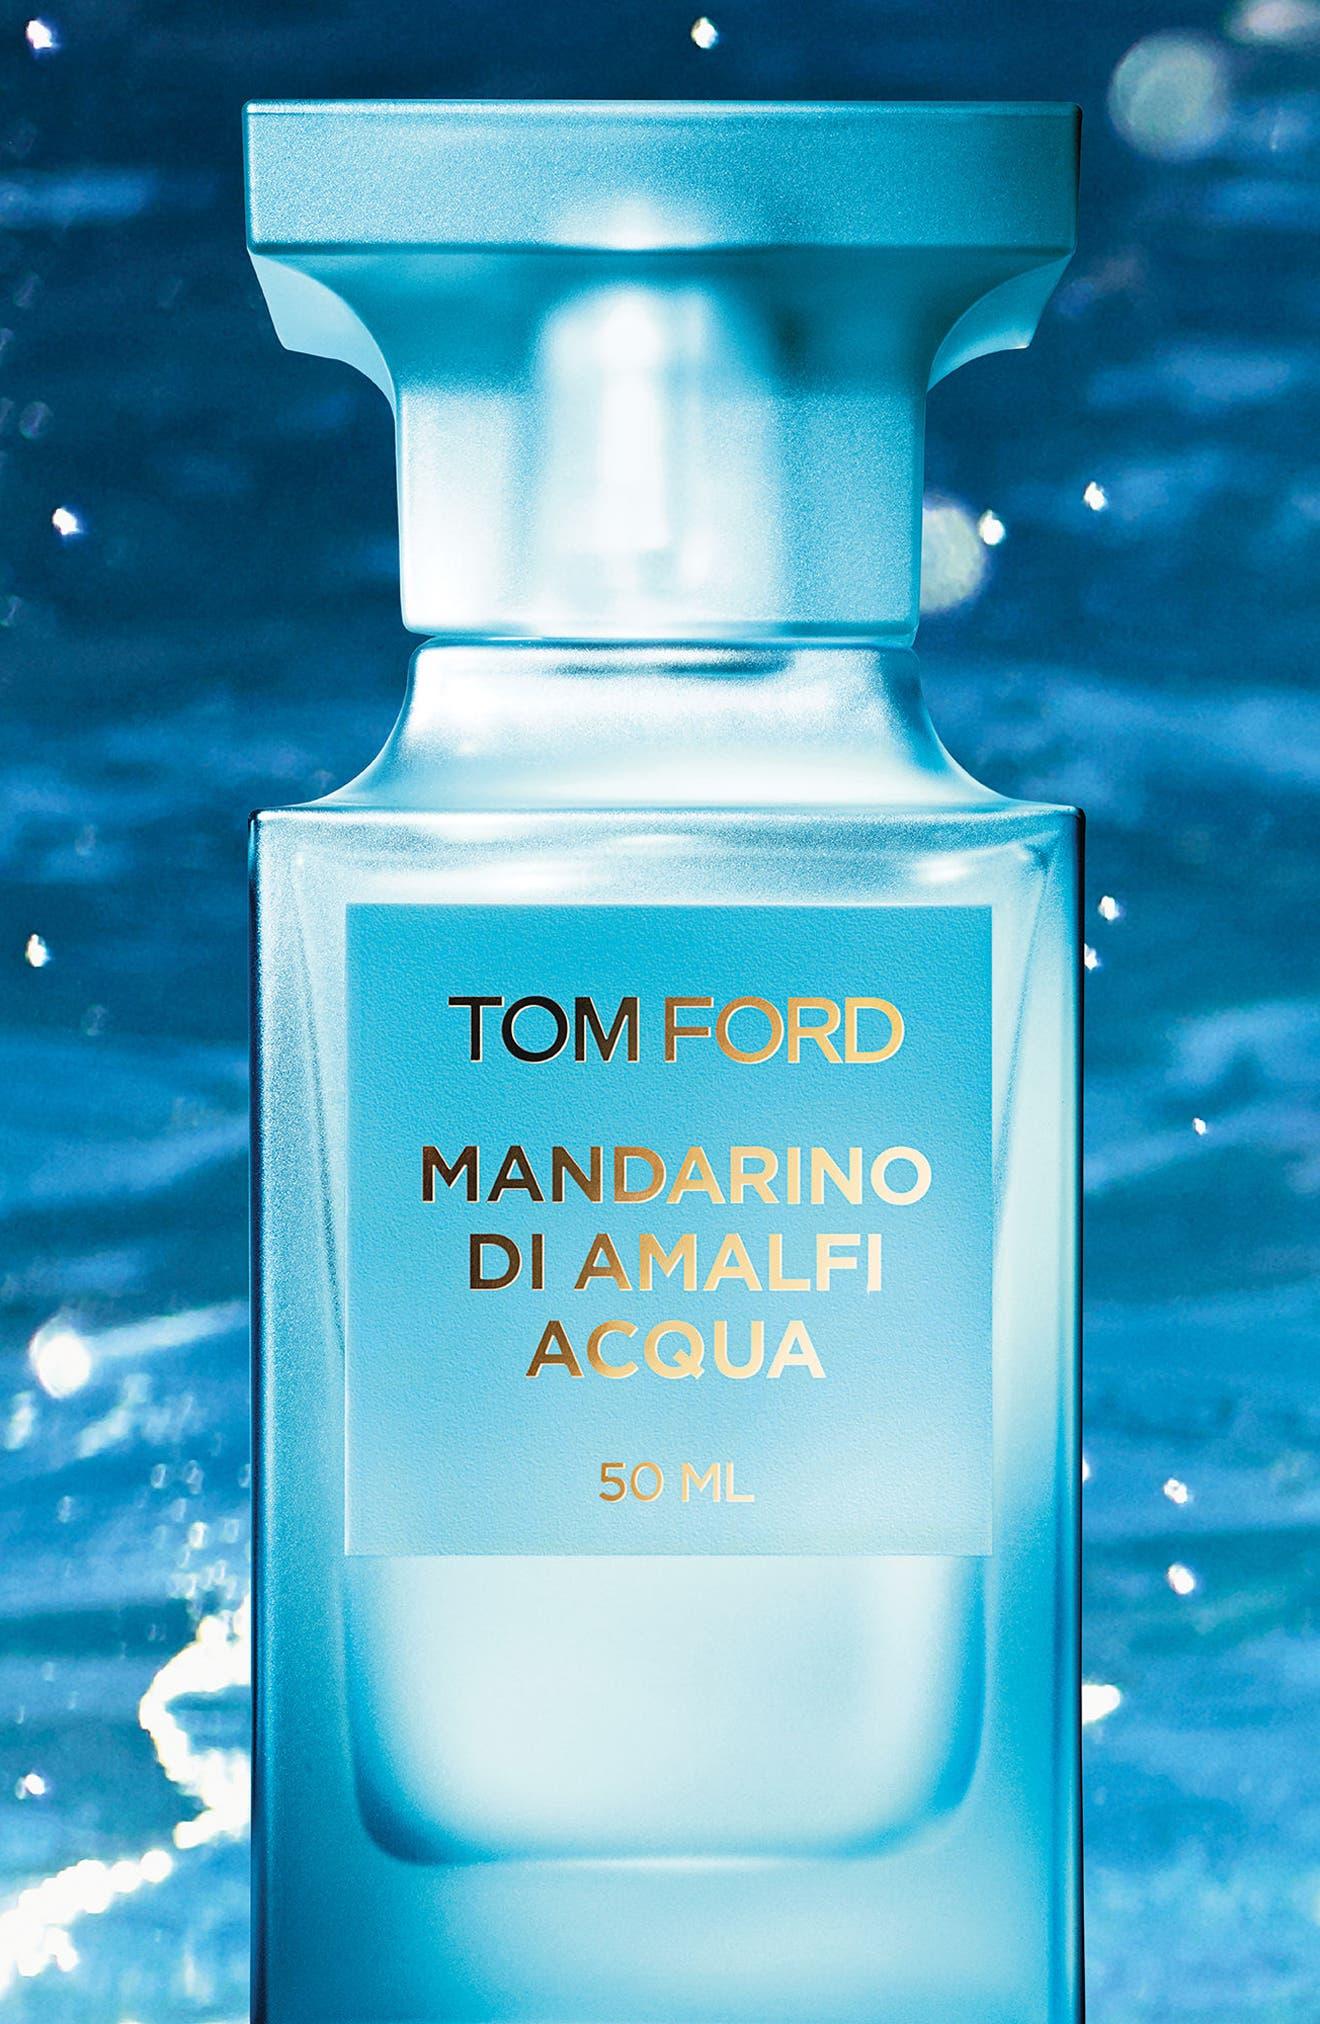 TOM FORD, Mandarino di Amalfi Acqua Eau de Toilette, Alternate thumbnail 2, color, NO COLOR